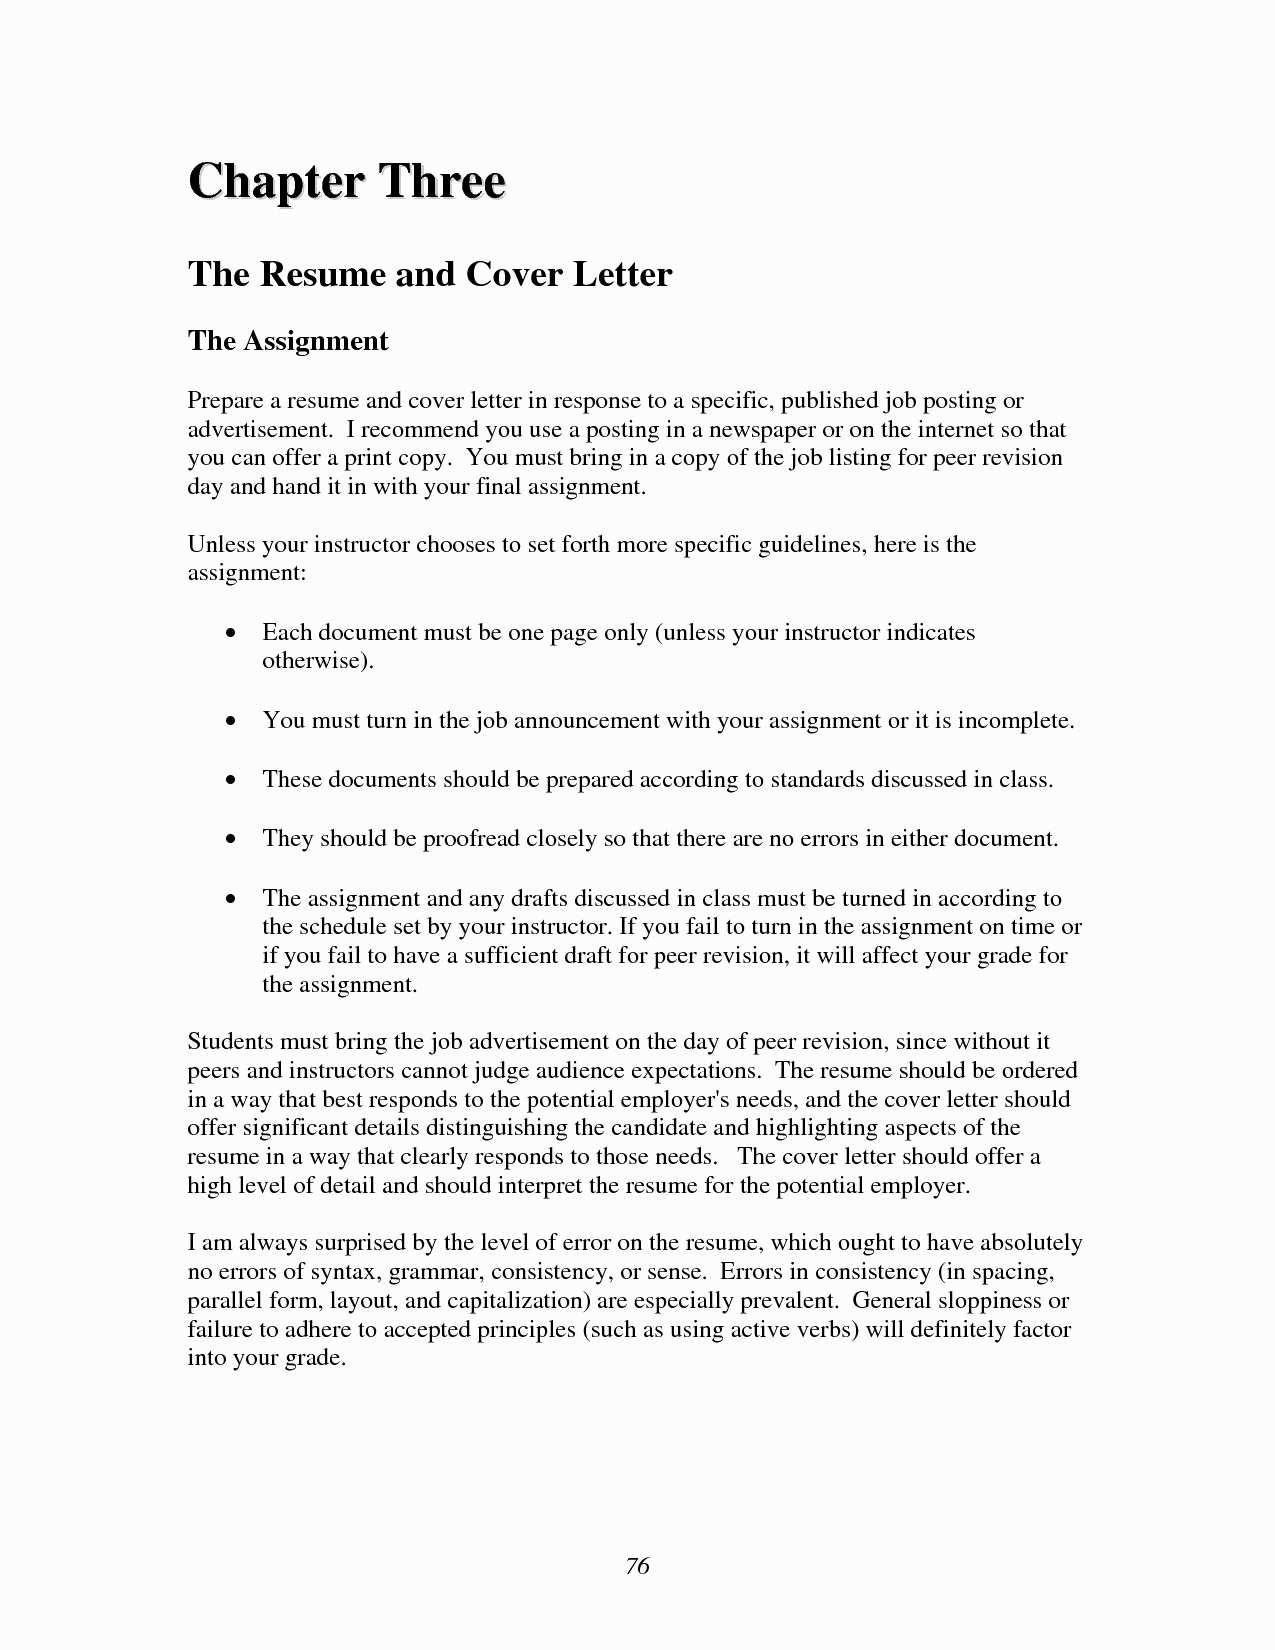 Official Job Offer Letter Template - formal Job Fer Letter Best Job Fer Letter Template Us Copy Od